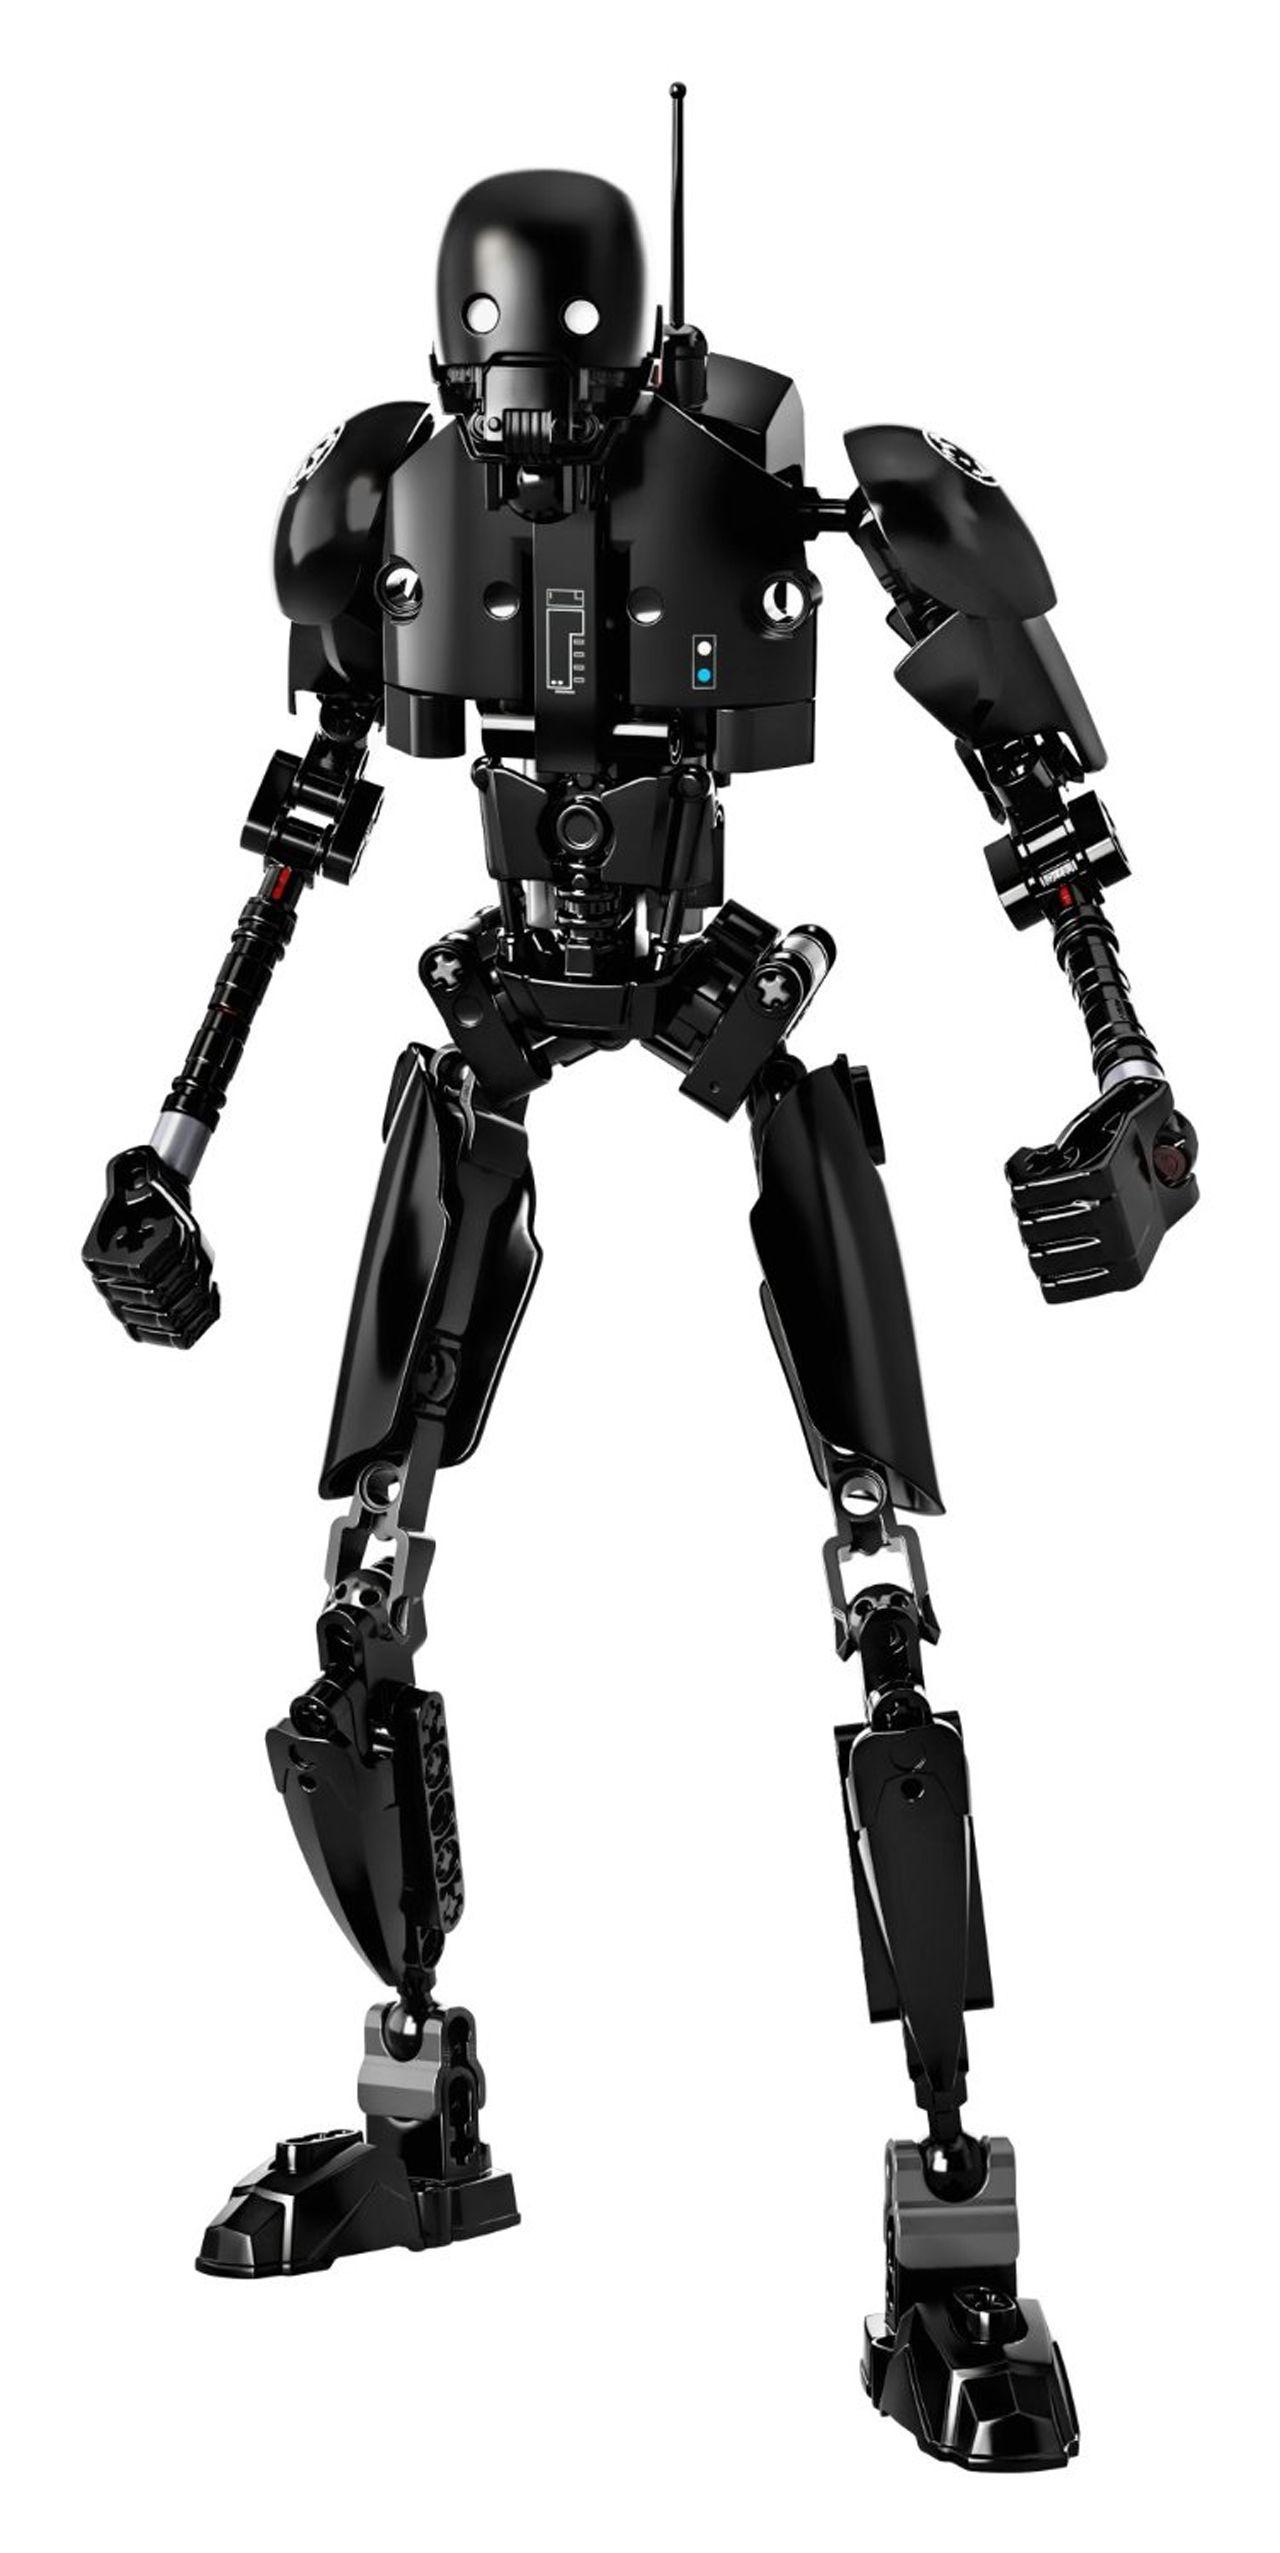 Rogue One sets revealed 스타워즈, 레고 및 로봇